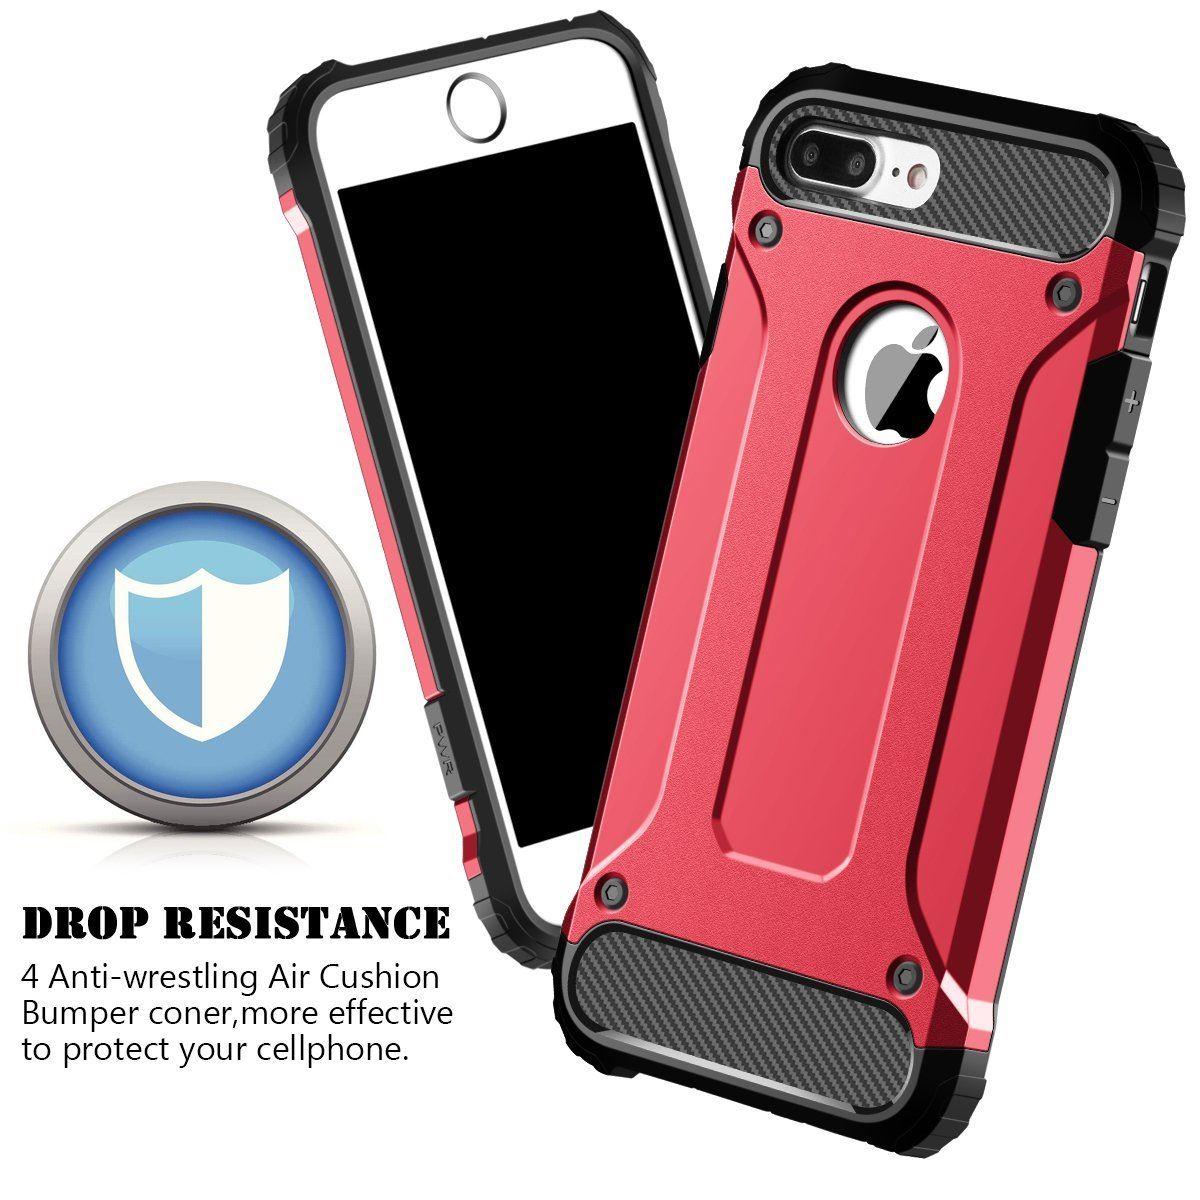 thumbnail 63 - For Apple iPhone 11 Pro Max XR Xs X 8 7 Plus 6 5 Se Case Cover Tough Armor